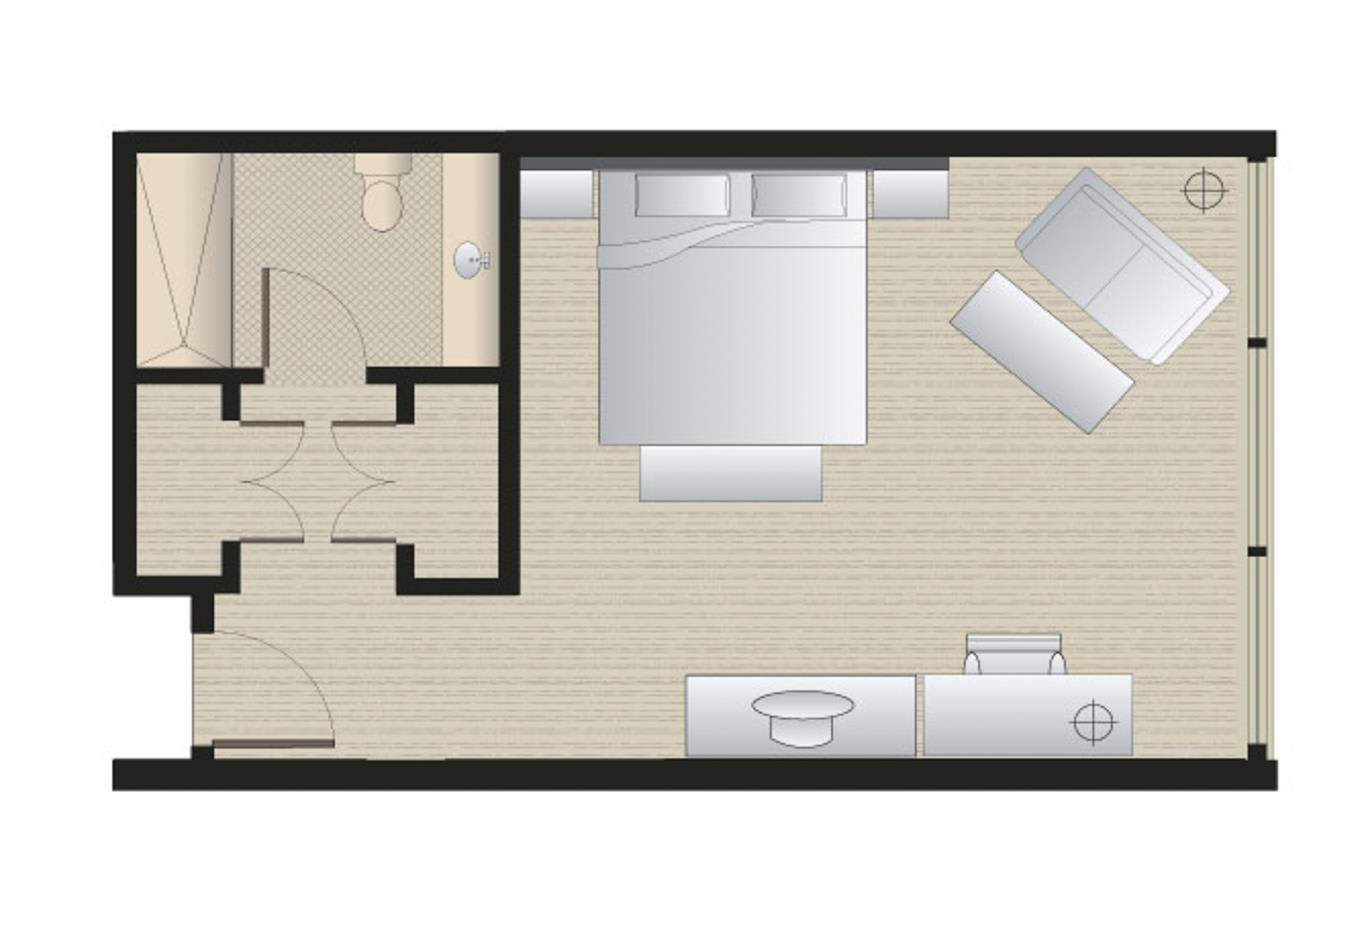 Executive king floorplan